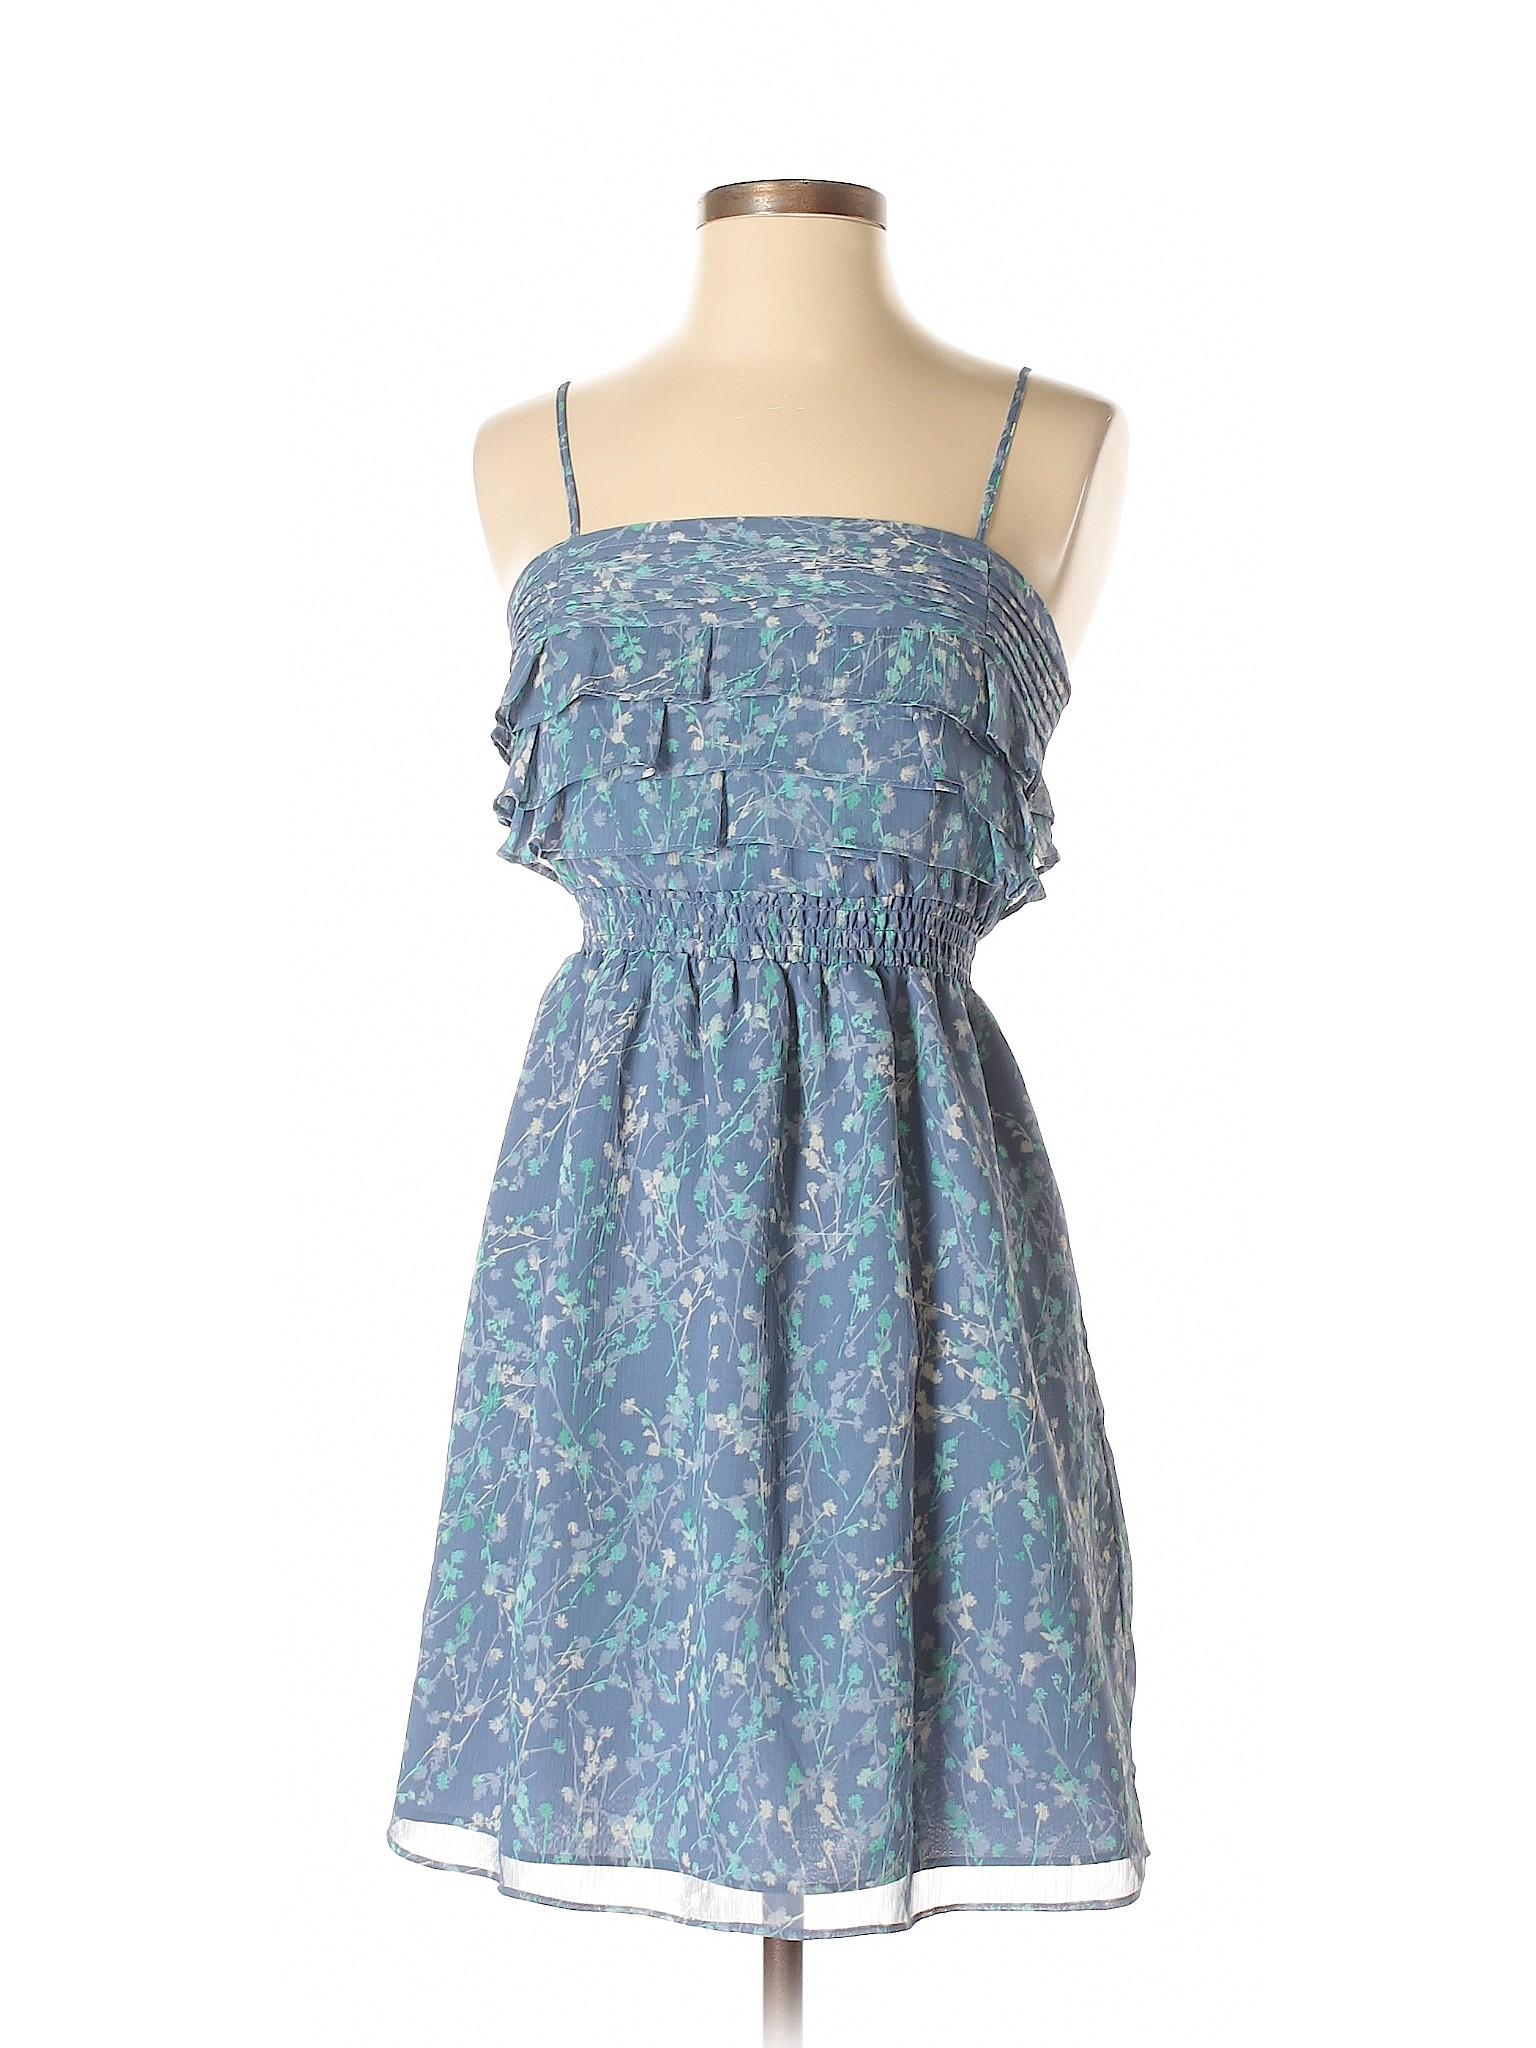 Lauren Dress Conrad LC Casual Selling vnOw0Cq5Ix